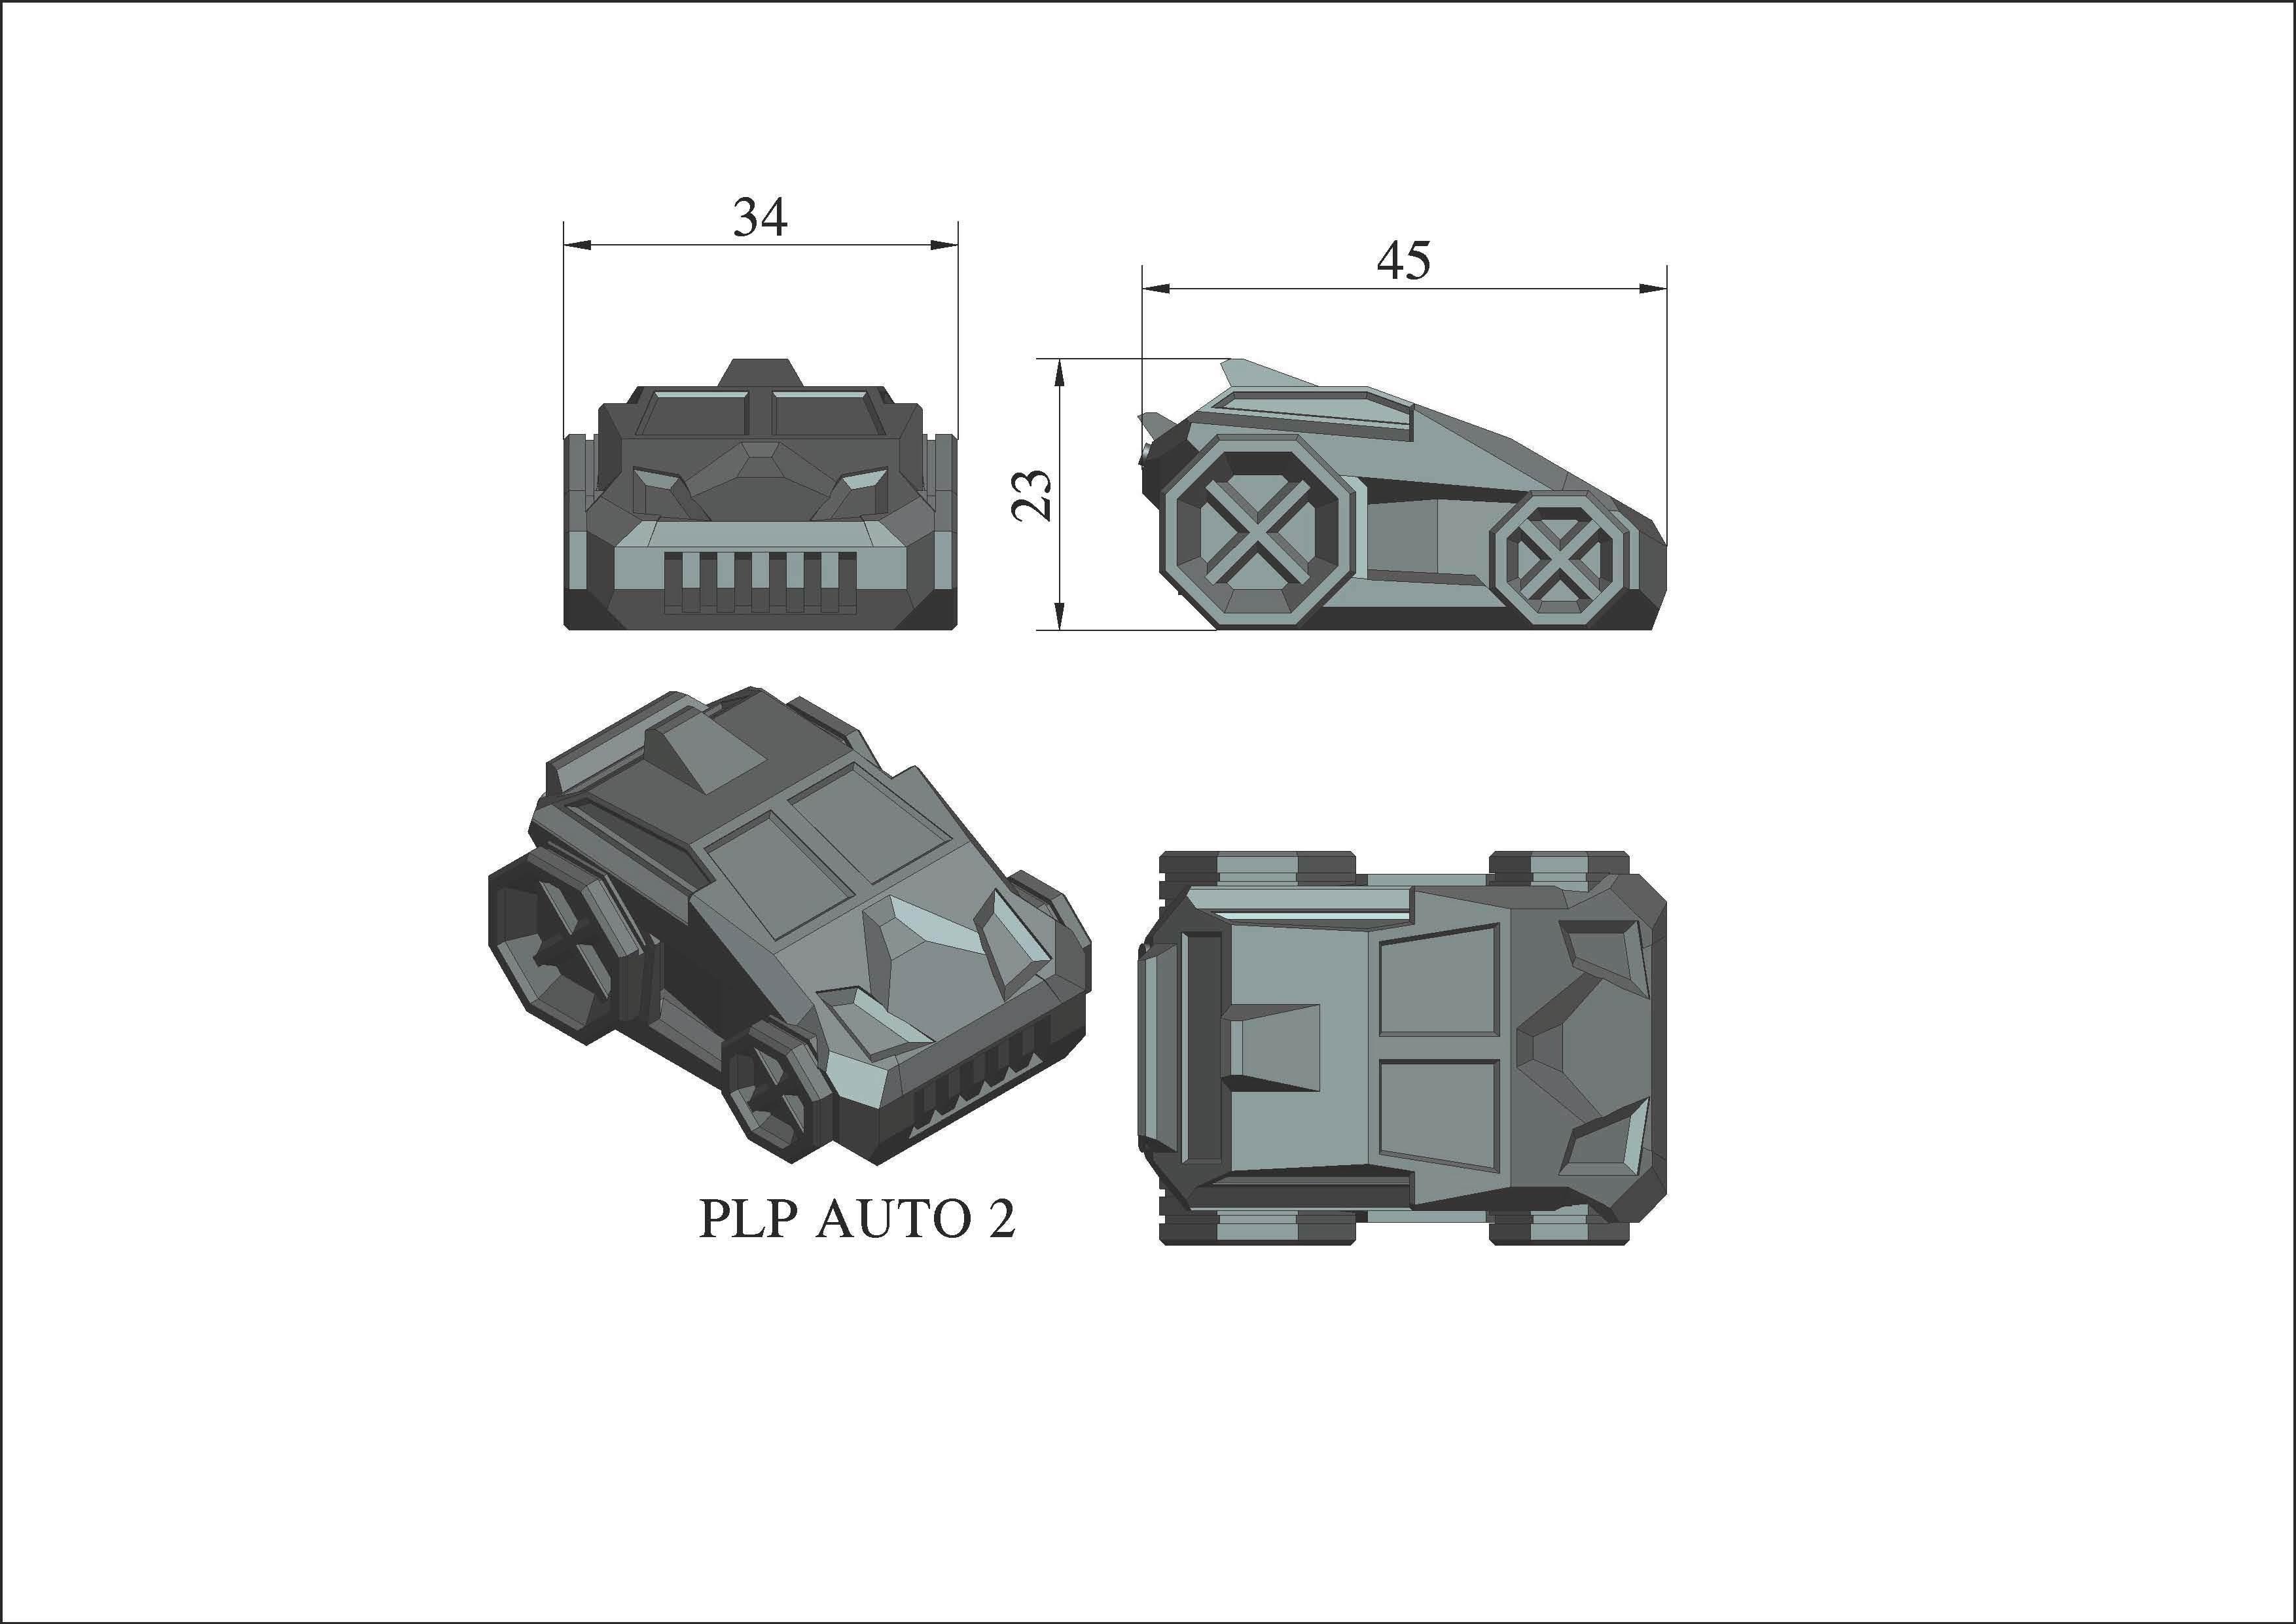 plp-auto-2.jpg Download STL file PLP AUTO 2 • 3D printable model, PLP